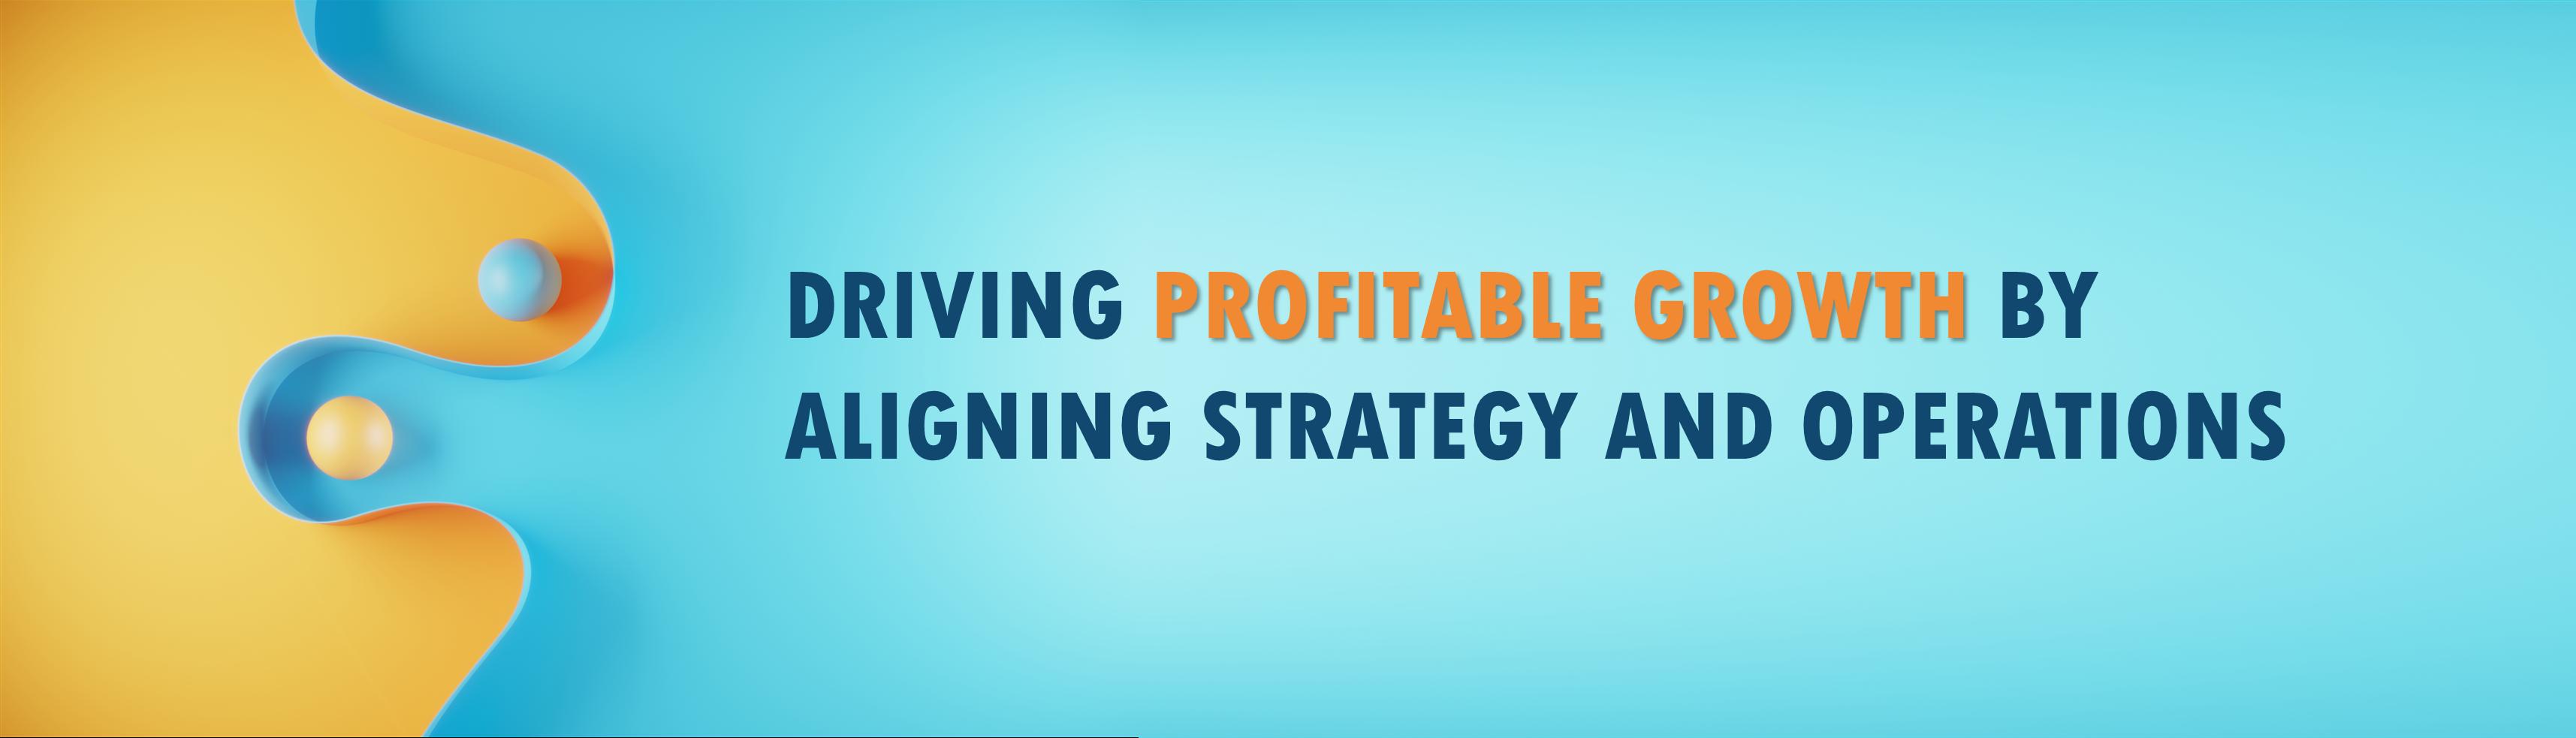 Driving profitable growth